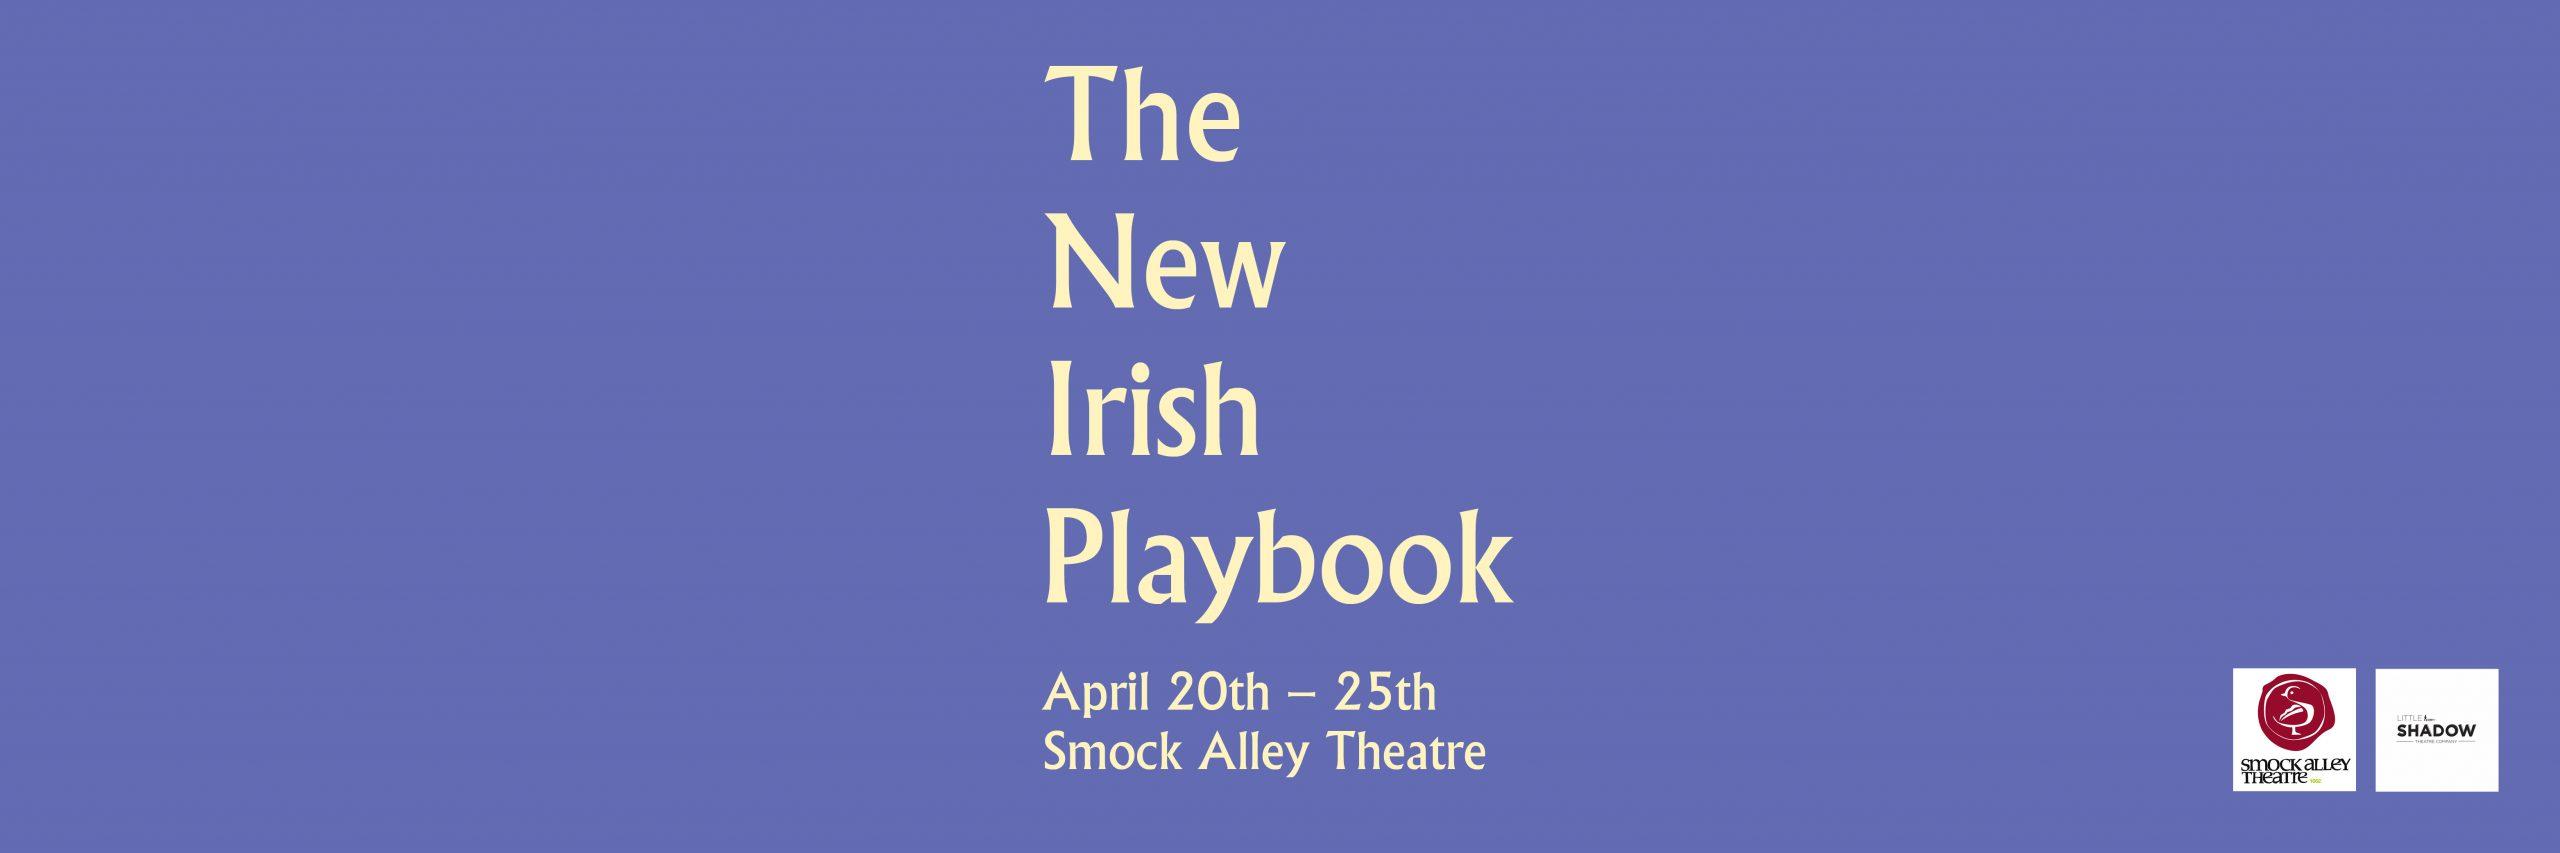 New Irish Playbook 1500x500 px scaled